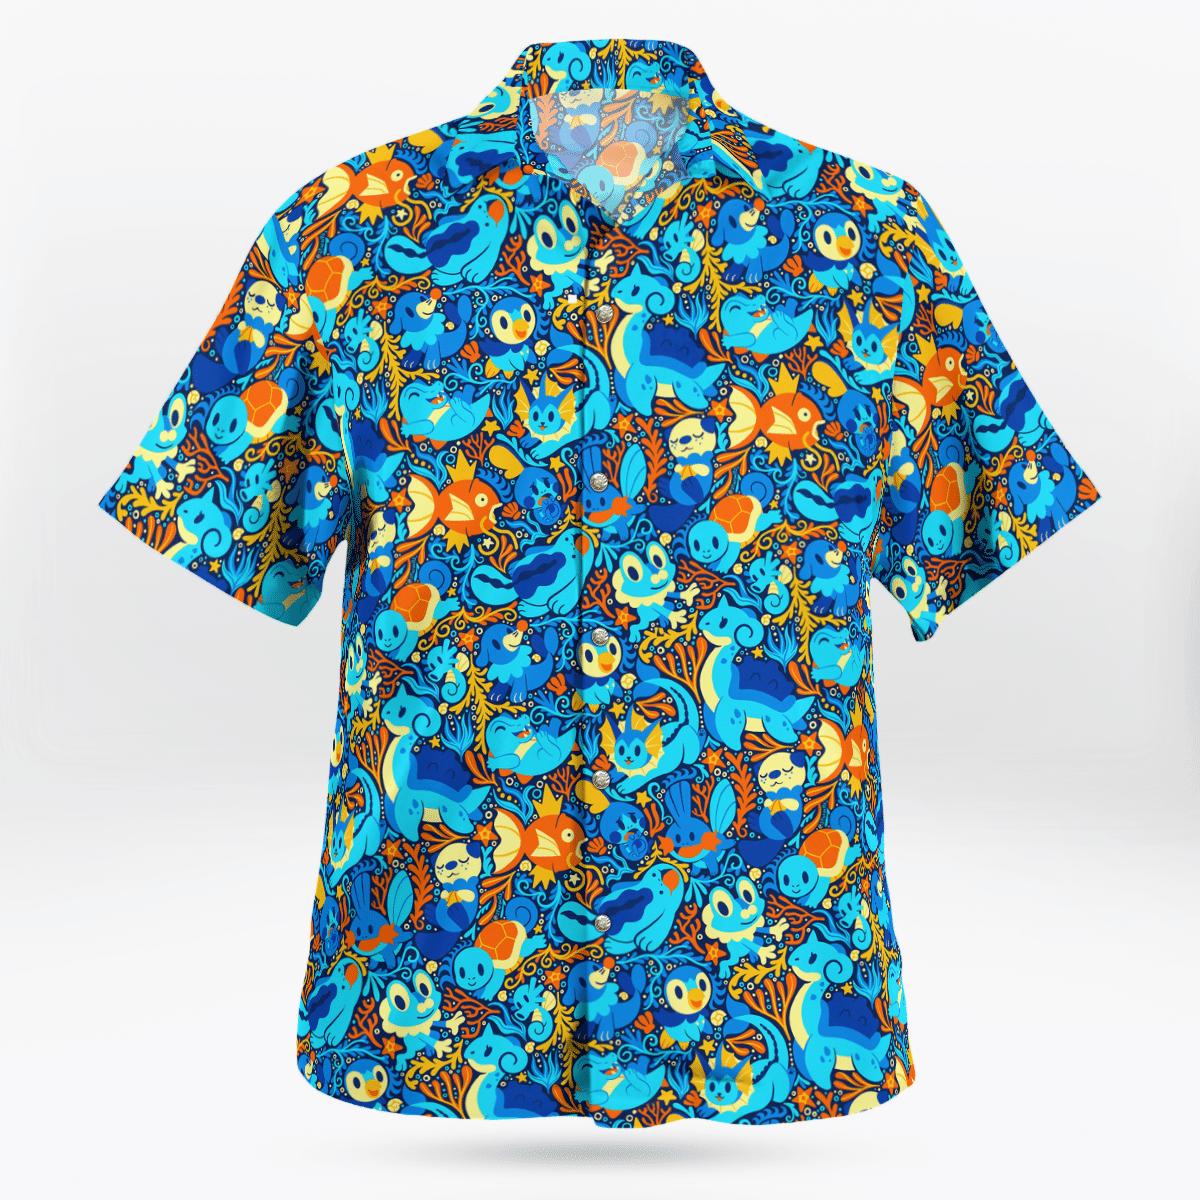 Water Pokemon Hawaiian shirt1